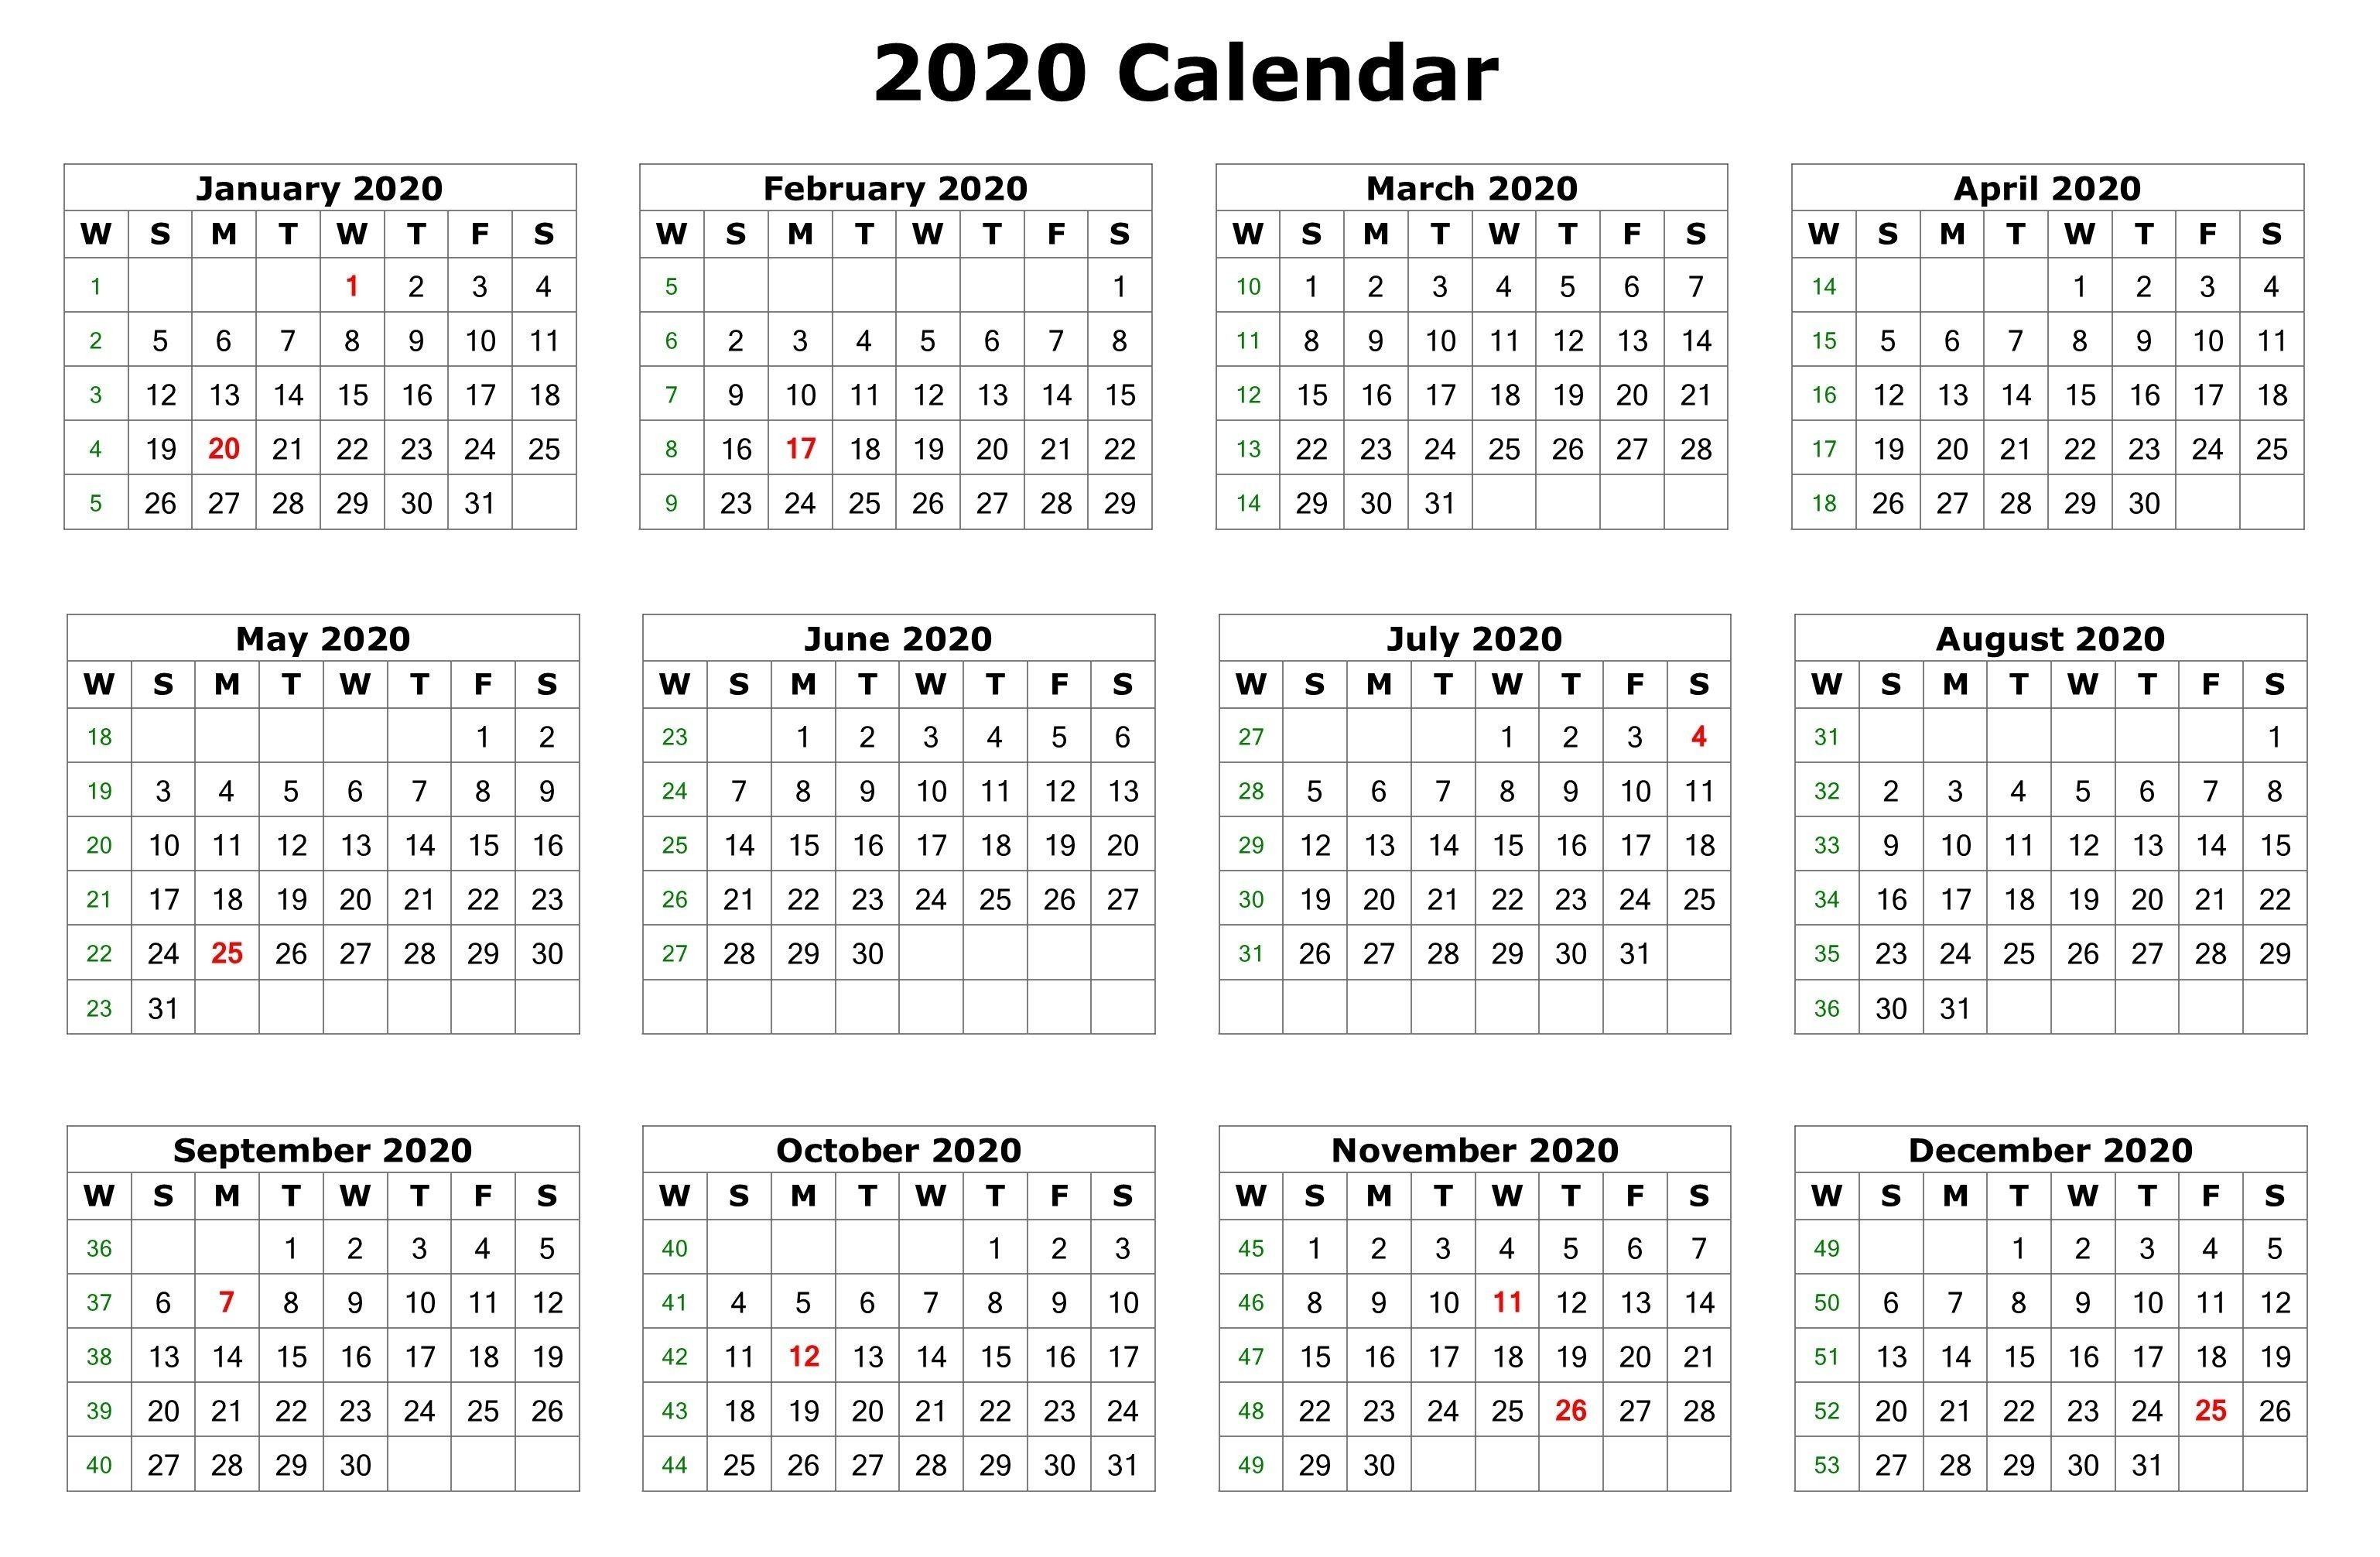 2020 12 Months Calendar Printable | Printable Calendar 2020-Monthly Print Calendars Templates 2020 Multiple Months Per Page